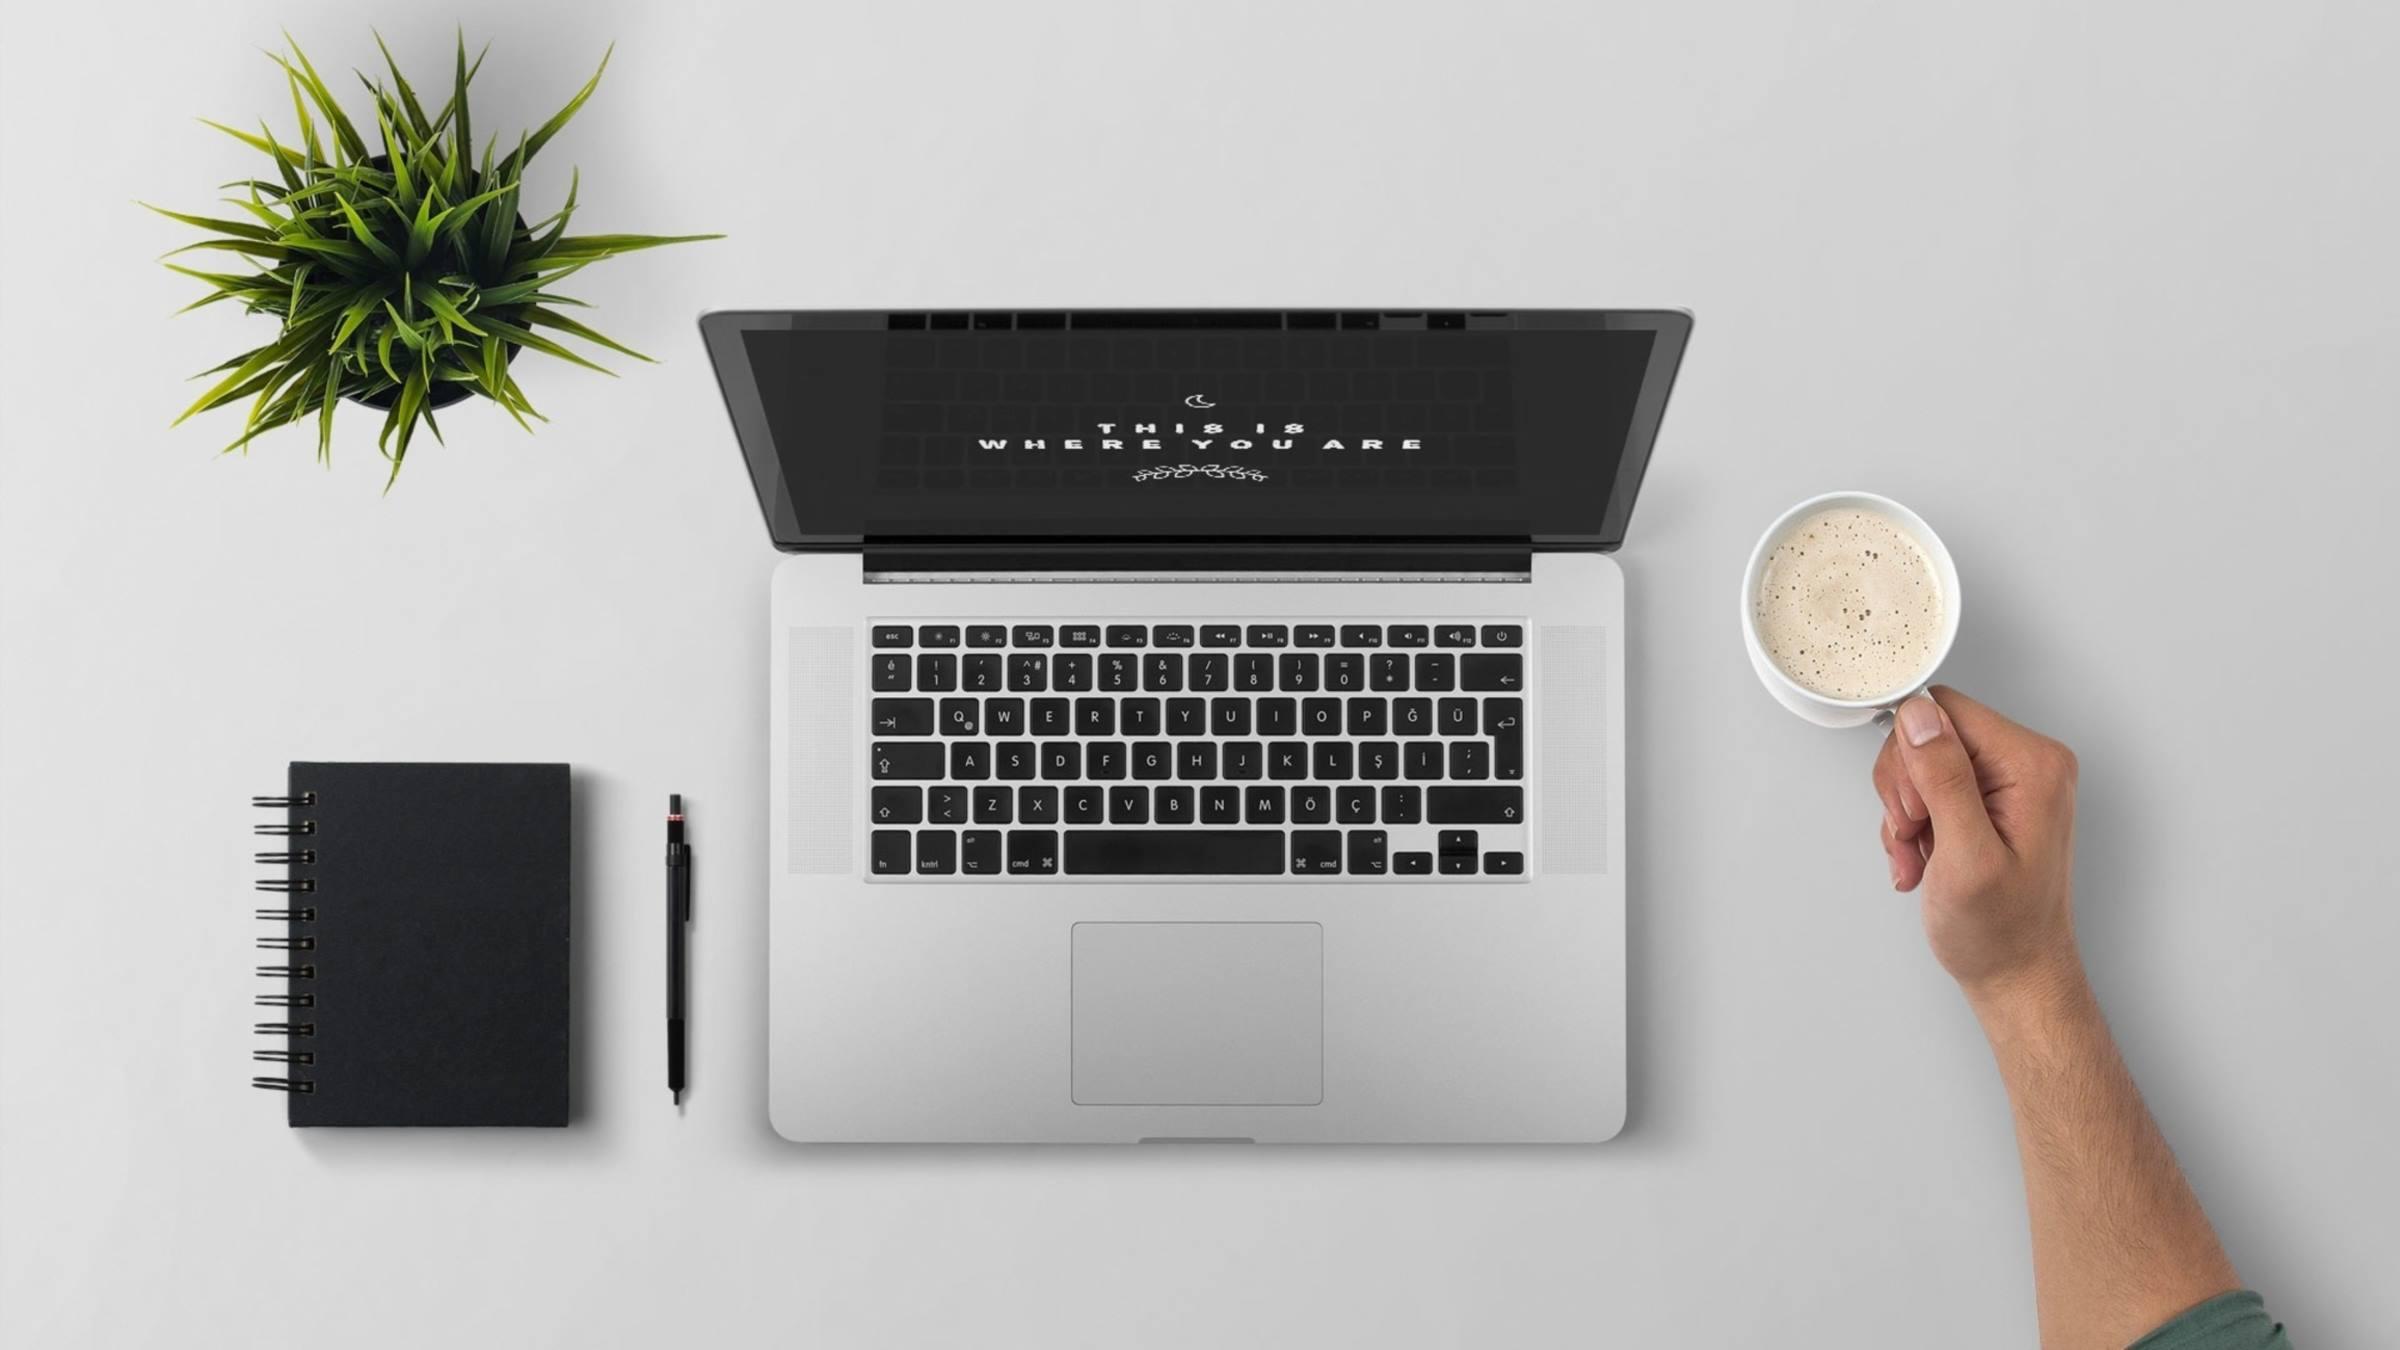 laptop plant notepad coffee arm